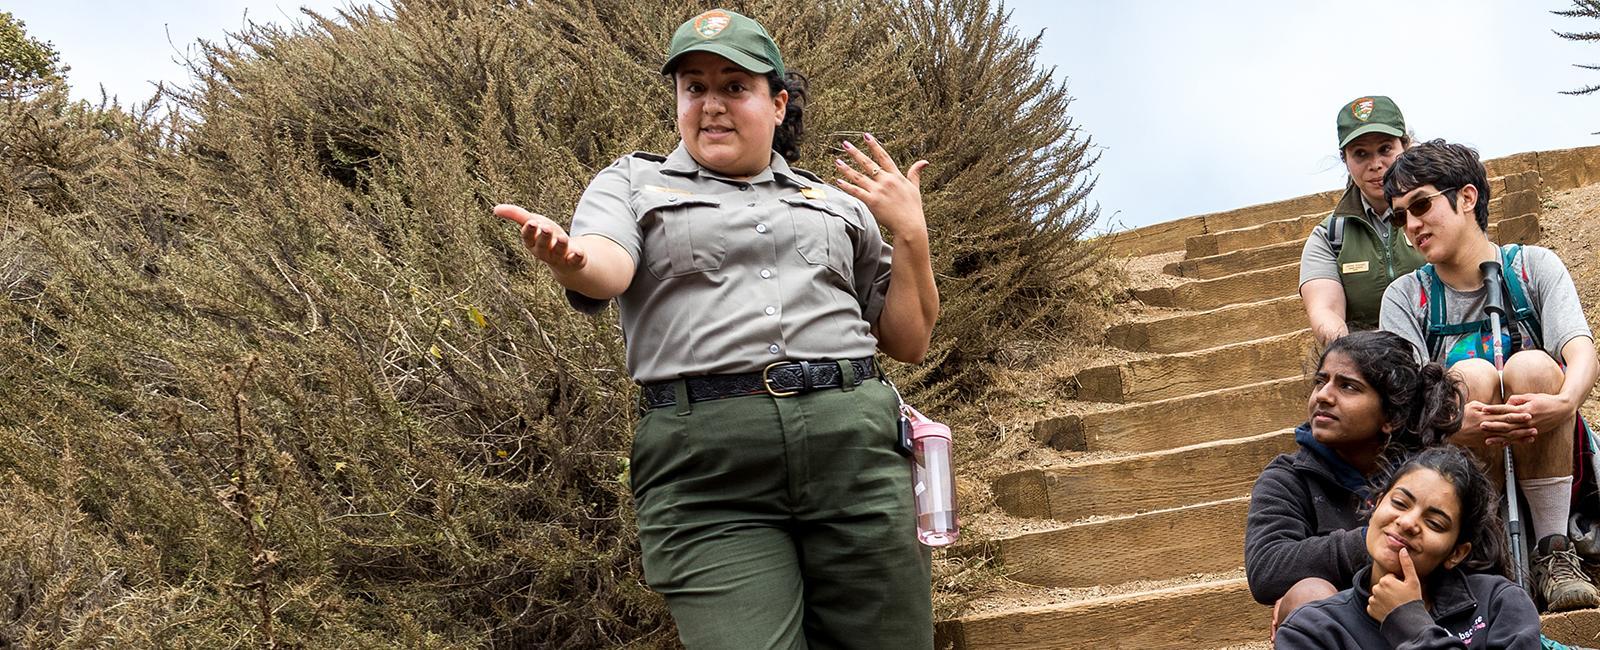 Ranger Maria Jose Alcantara speaks with youth